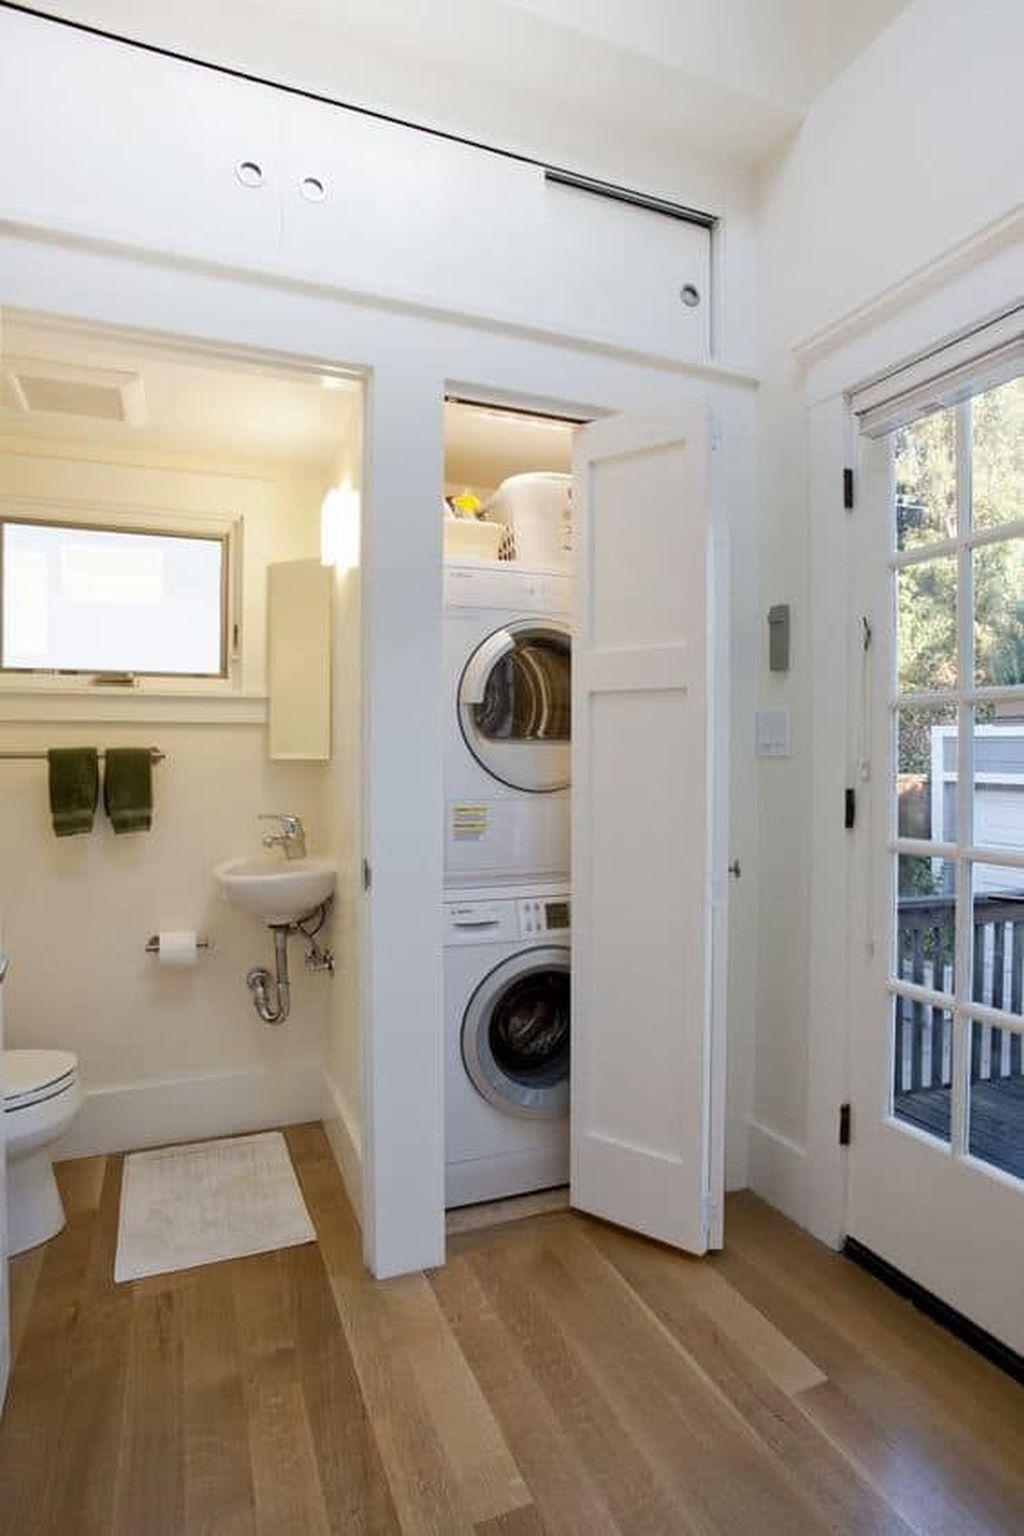 42 Minimalist Small Laundry Room Organization Ideas images